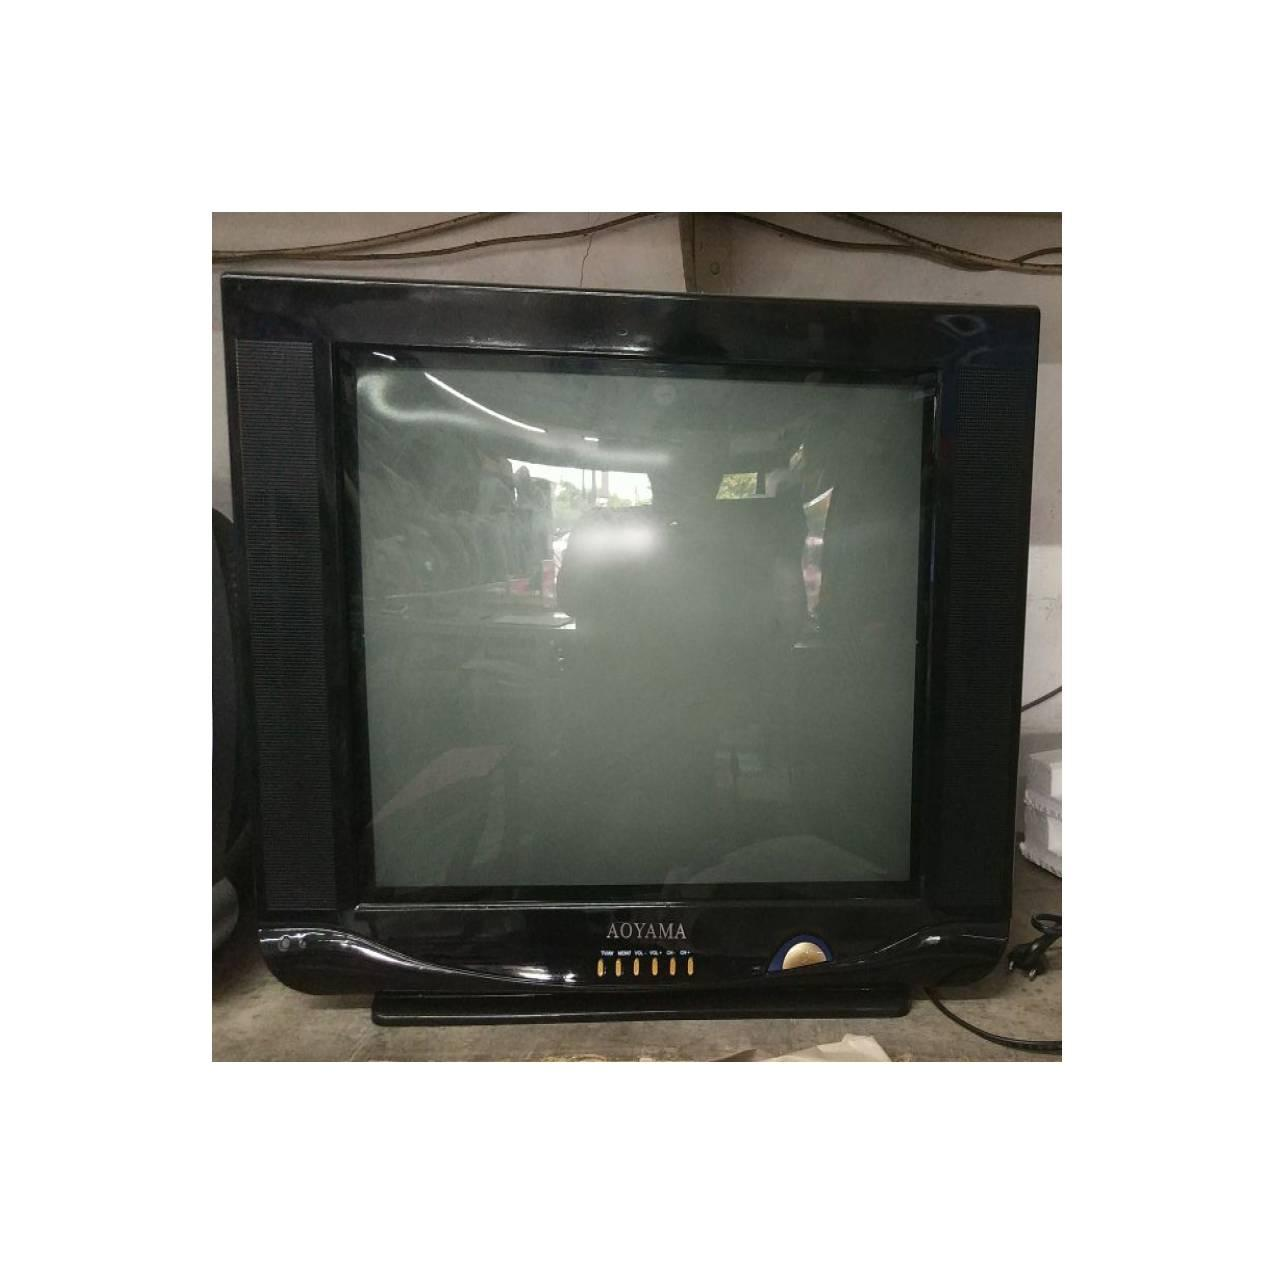 TV Tabung Aoyama UltraSlim Flat 21